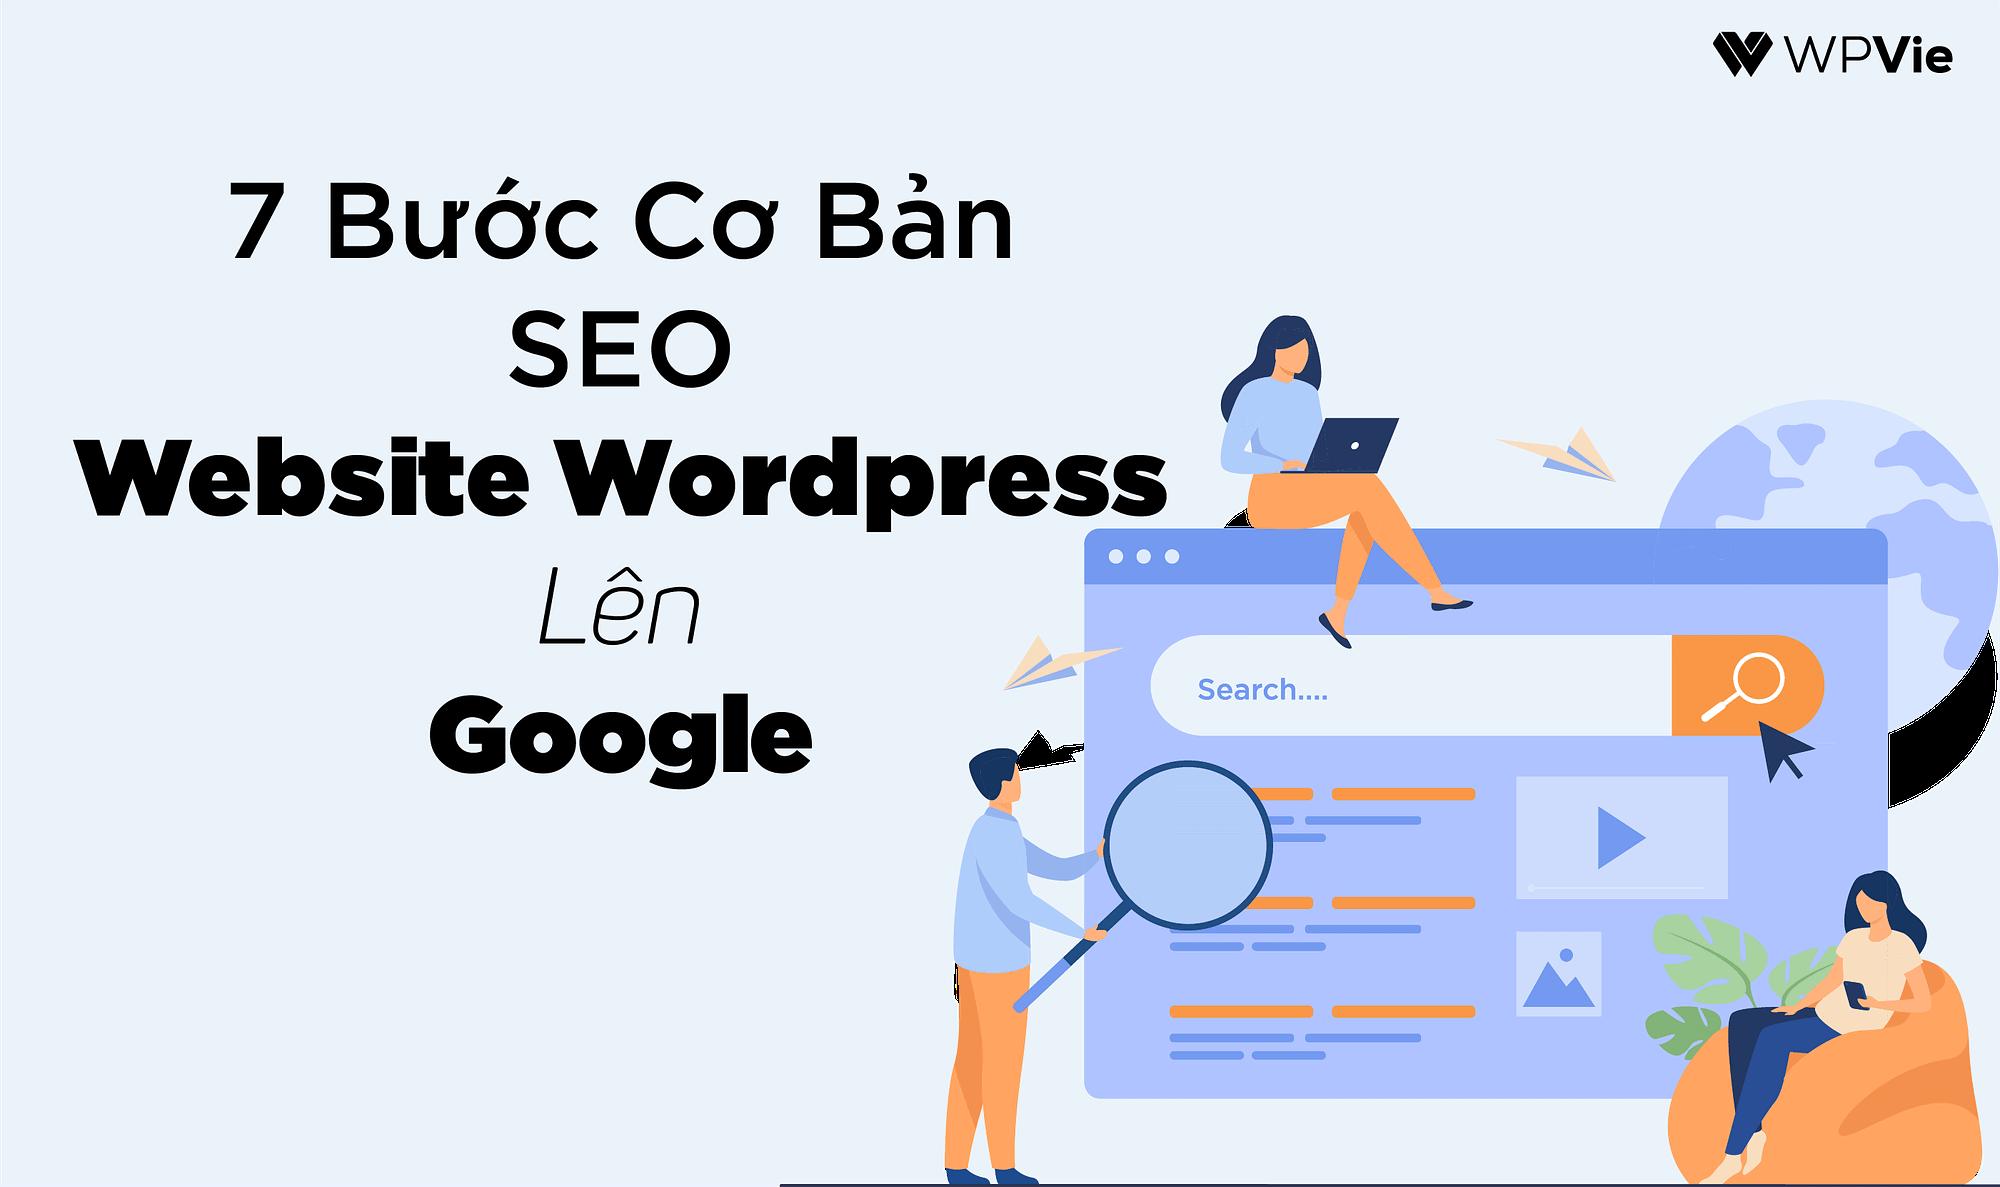 Hướng dẫn SEO cơ bản: Cách để seo website wordpress lên google